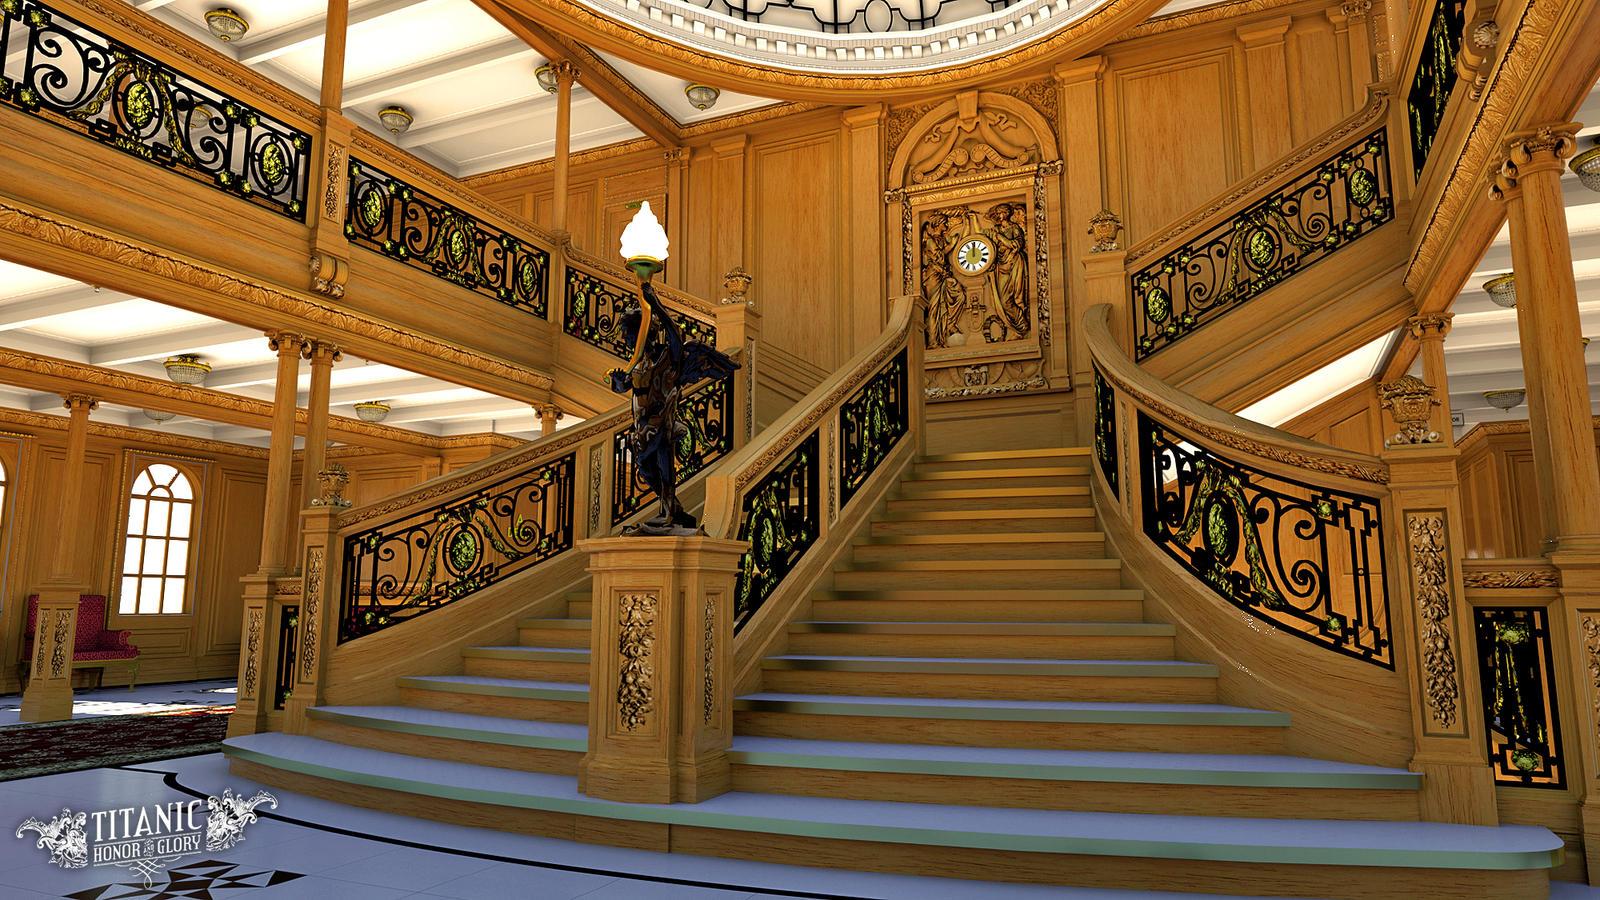 Titanics Grand Staircase By TitanicHonorAndGlory On